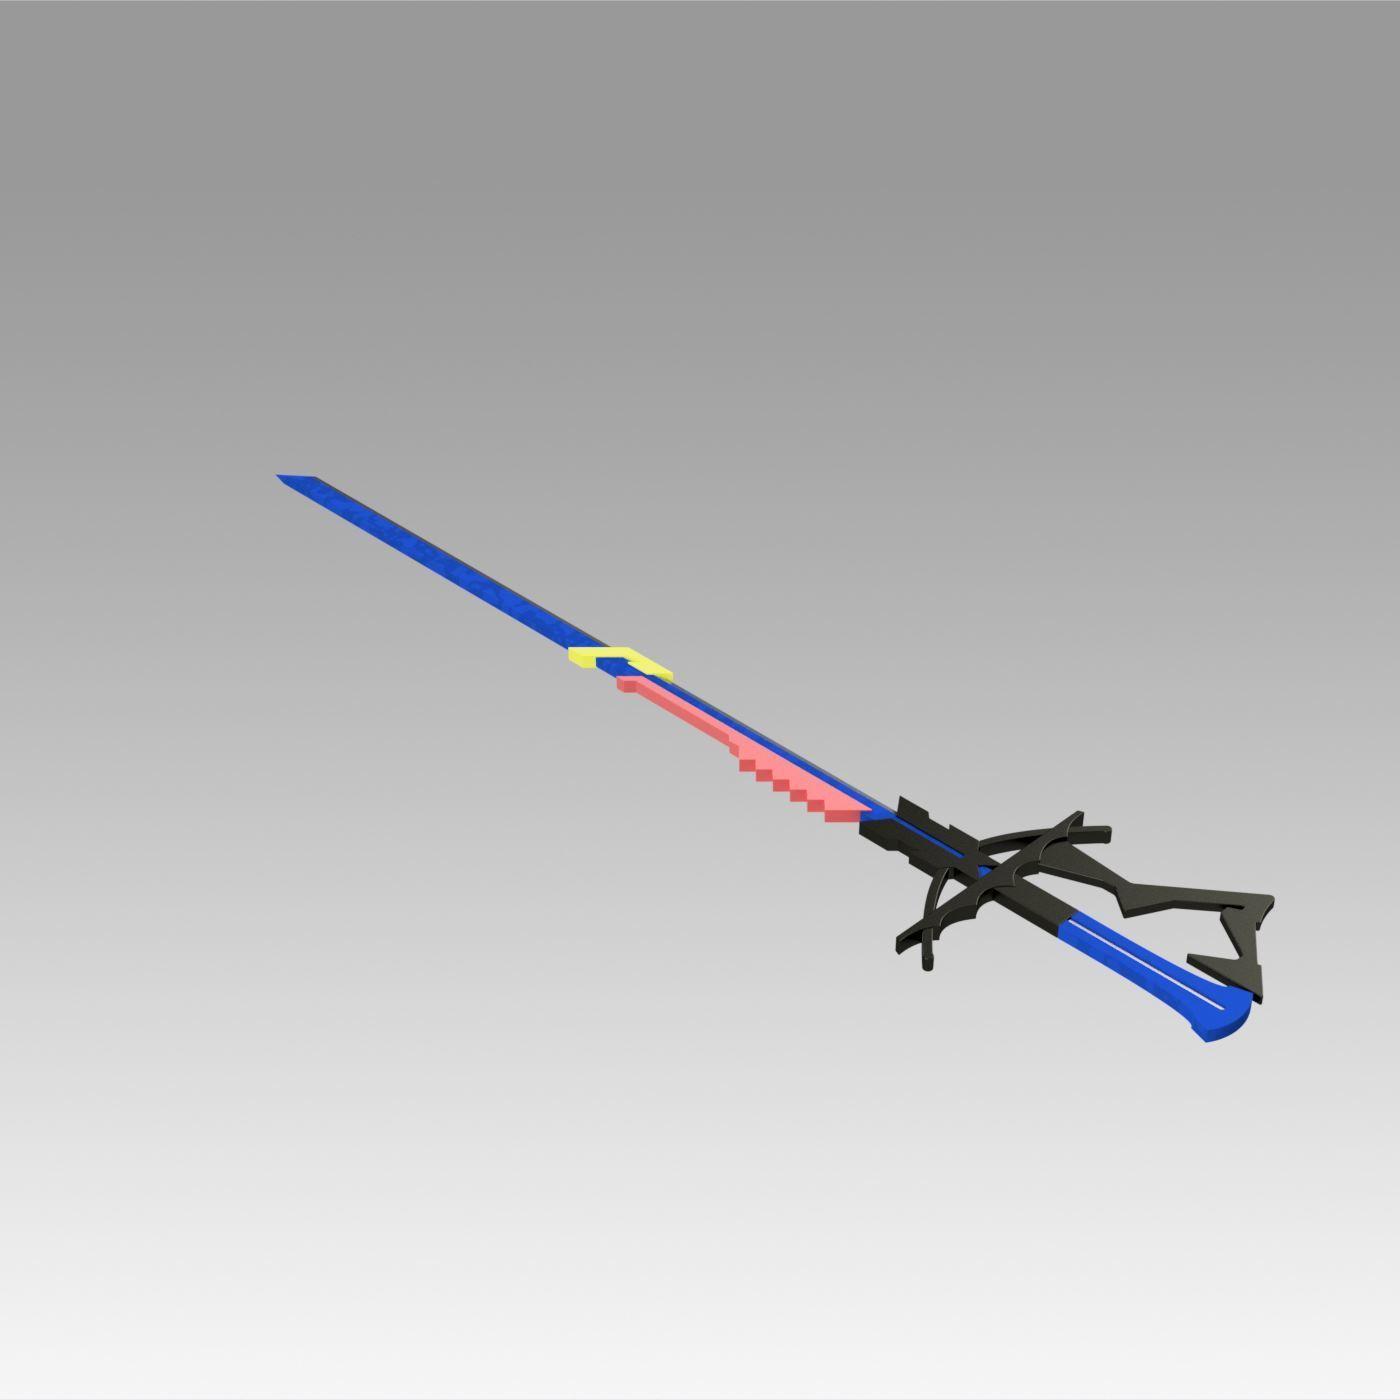 8.jpg Download OBJ file Arknights Astesia Epoque Sword Cosplay Weapon Prop  • 3D printable template, Blackeveryday